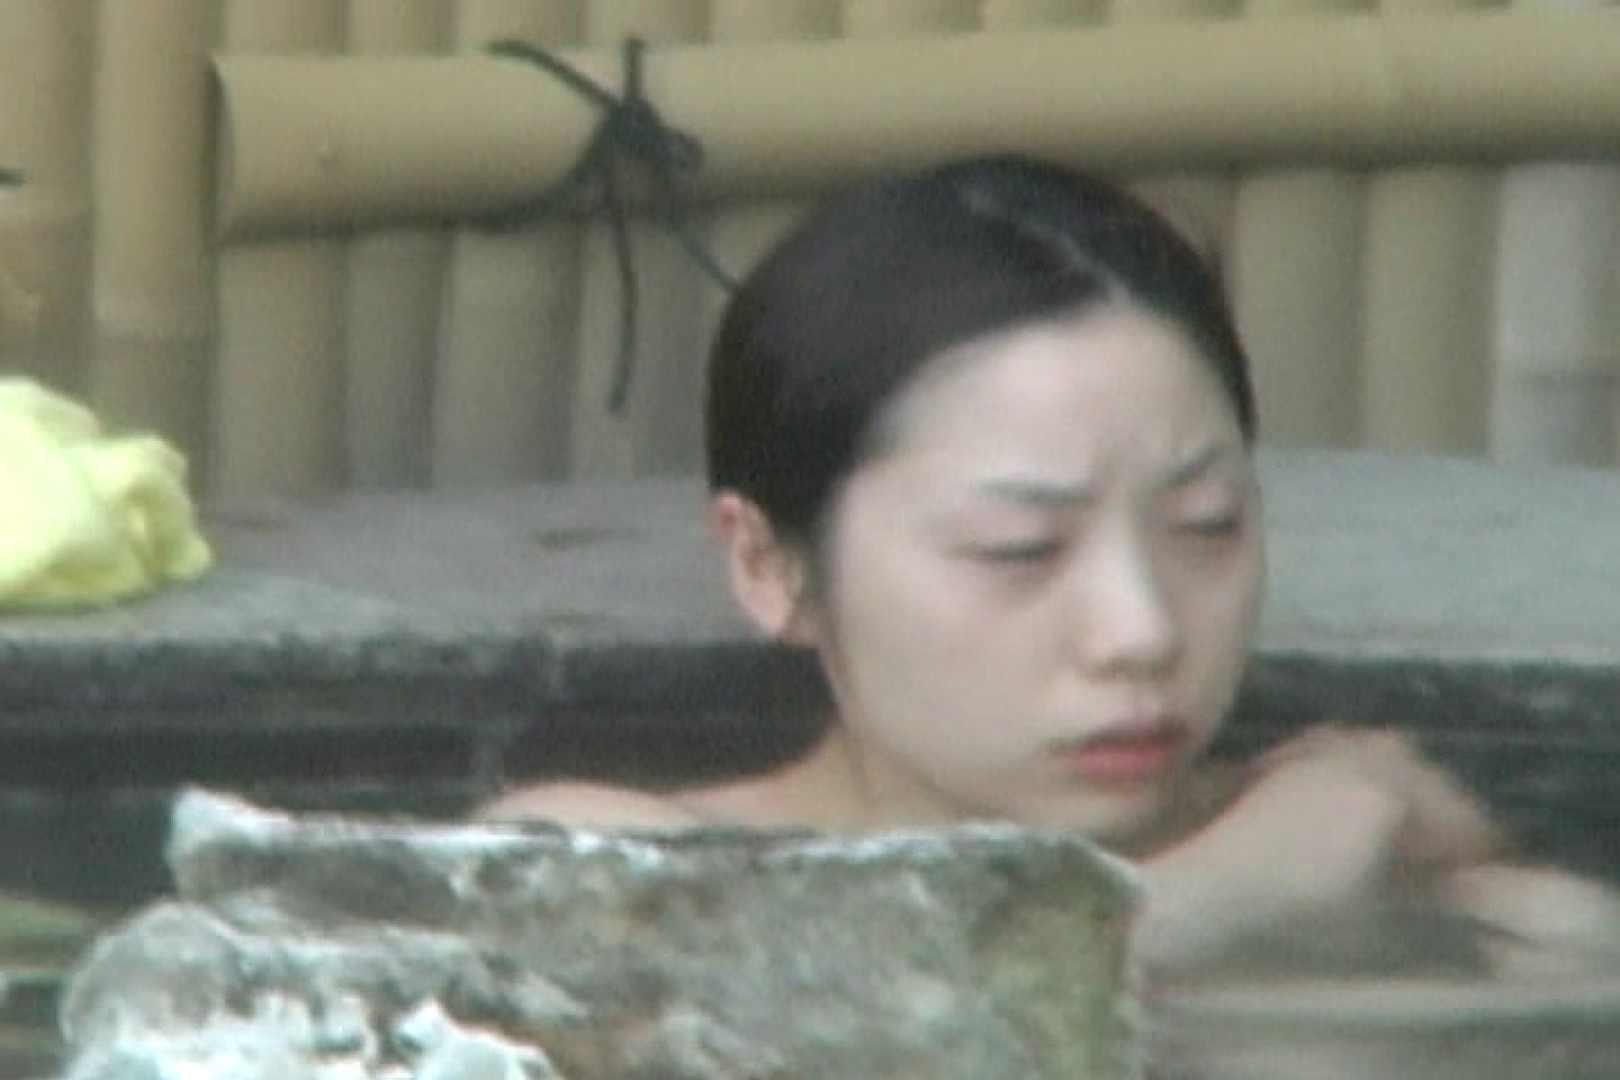 Aquaな露天風呂Vol.596 OLセックス  77画像 27